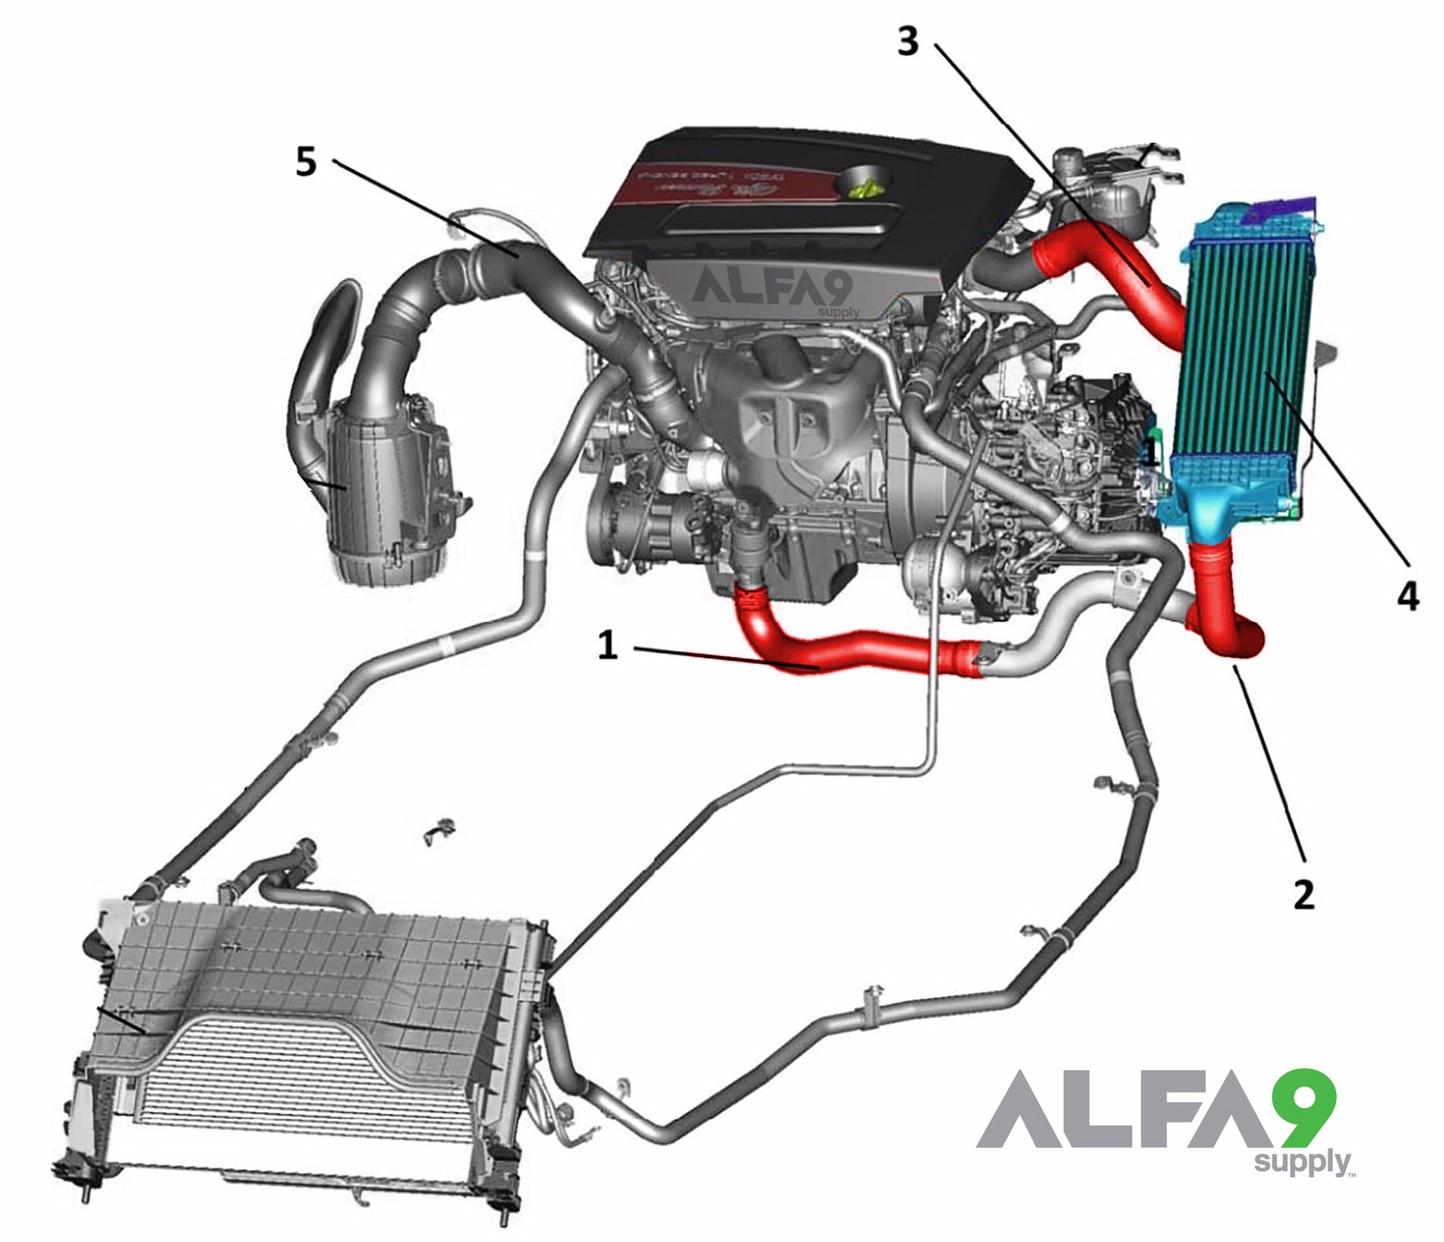 Alfa Romeo 4c Engine Diagram Wiring 156 Electrical Stock Intercooler Hoses Not Strong Enough Forums 2014 Gta